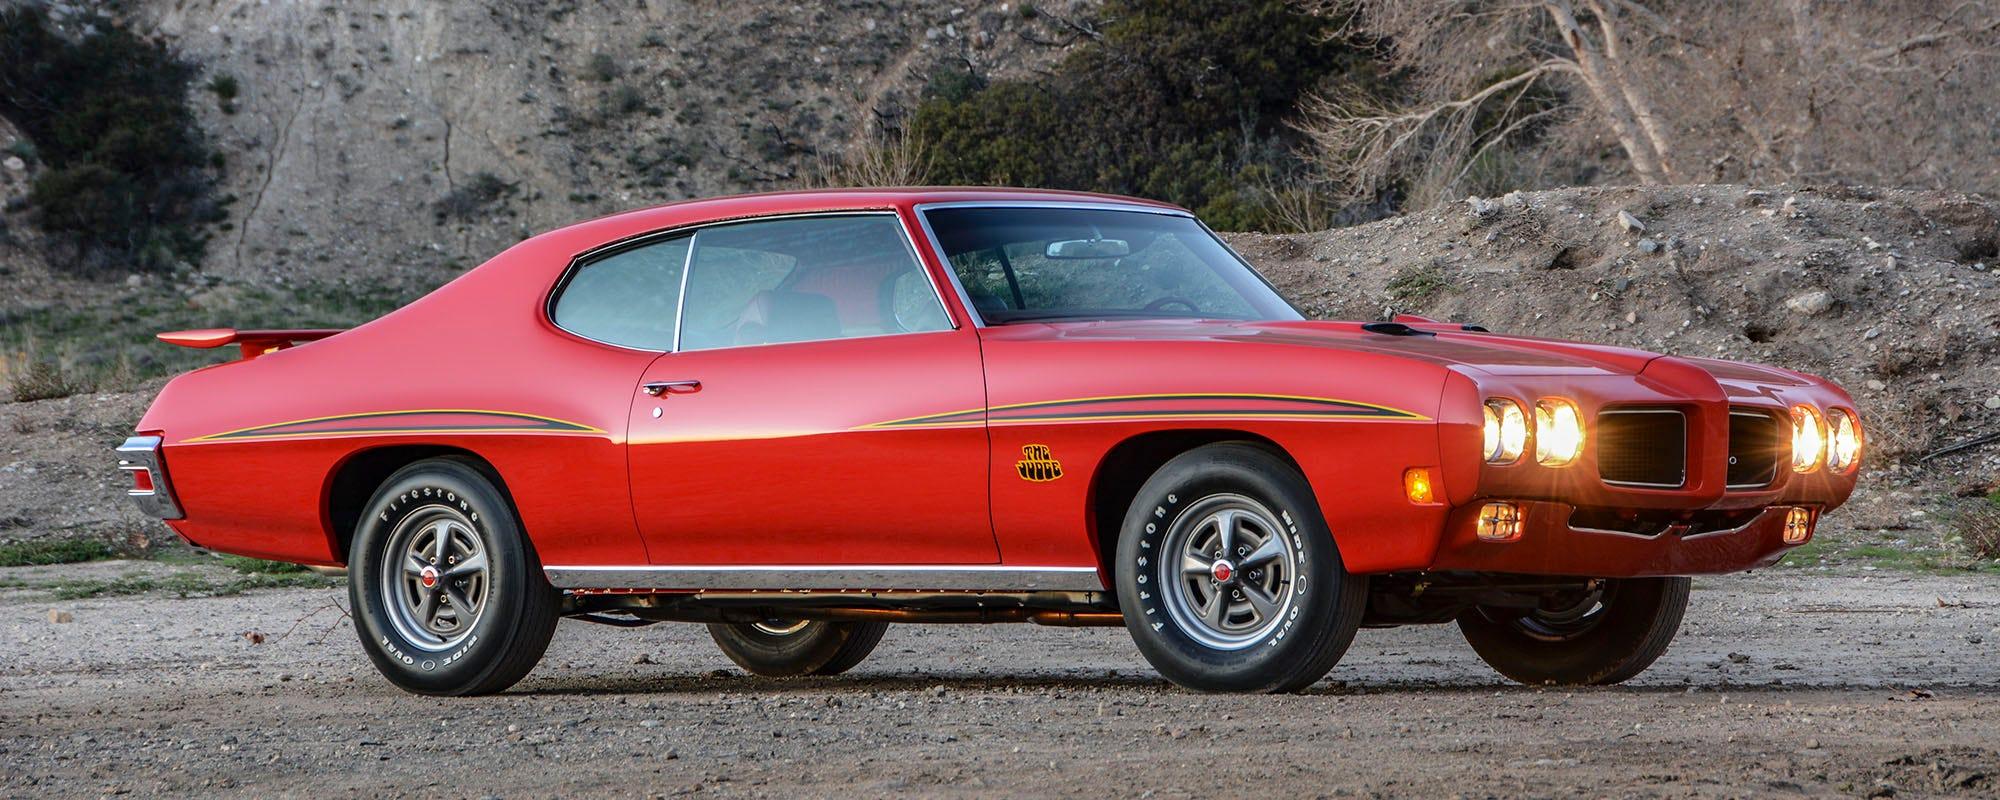 1970 Pontiac GTO Judge with Firestone Wide Oval Radial tires